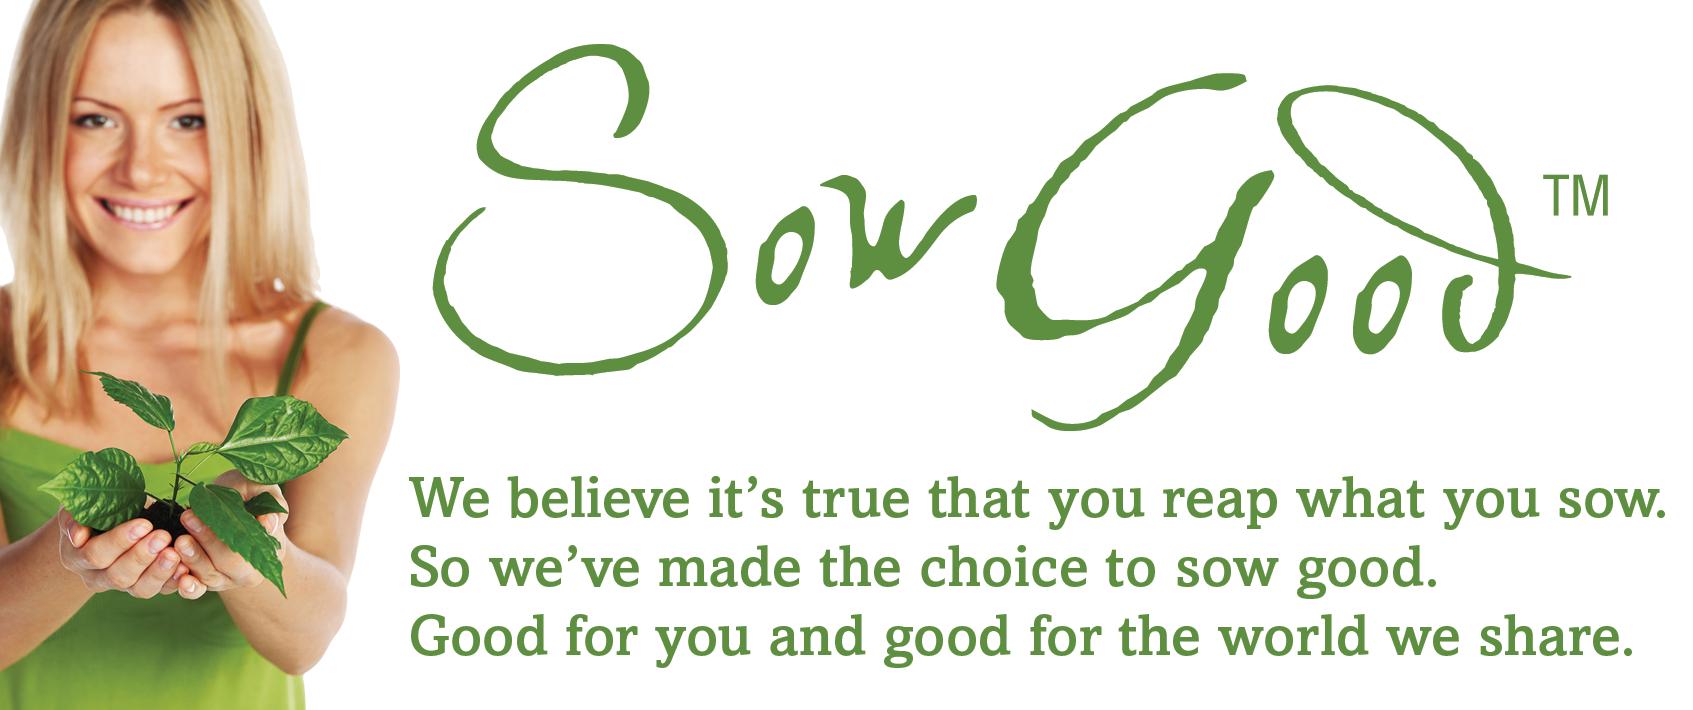 Sow Good